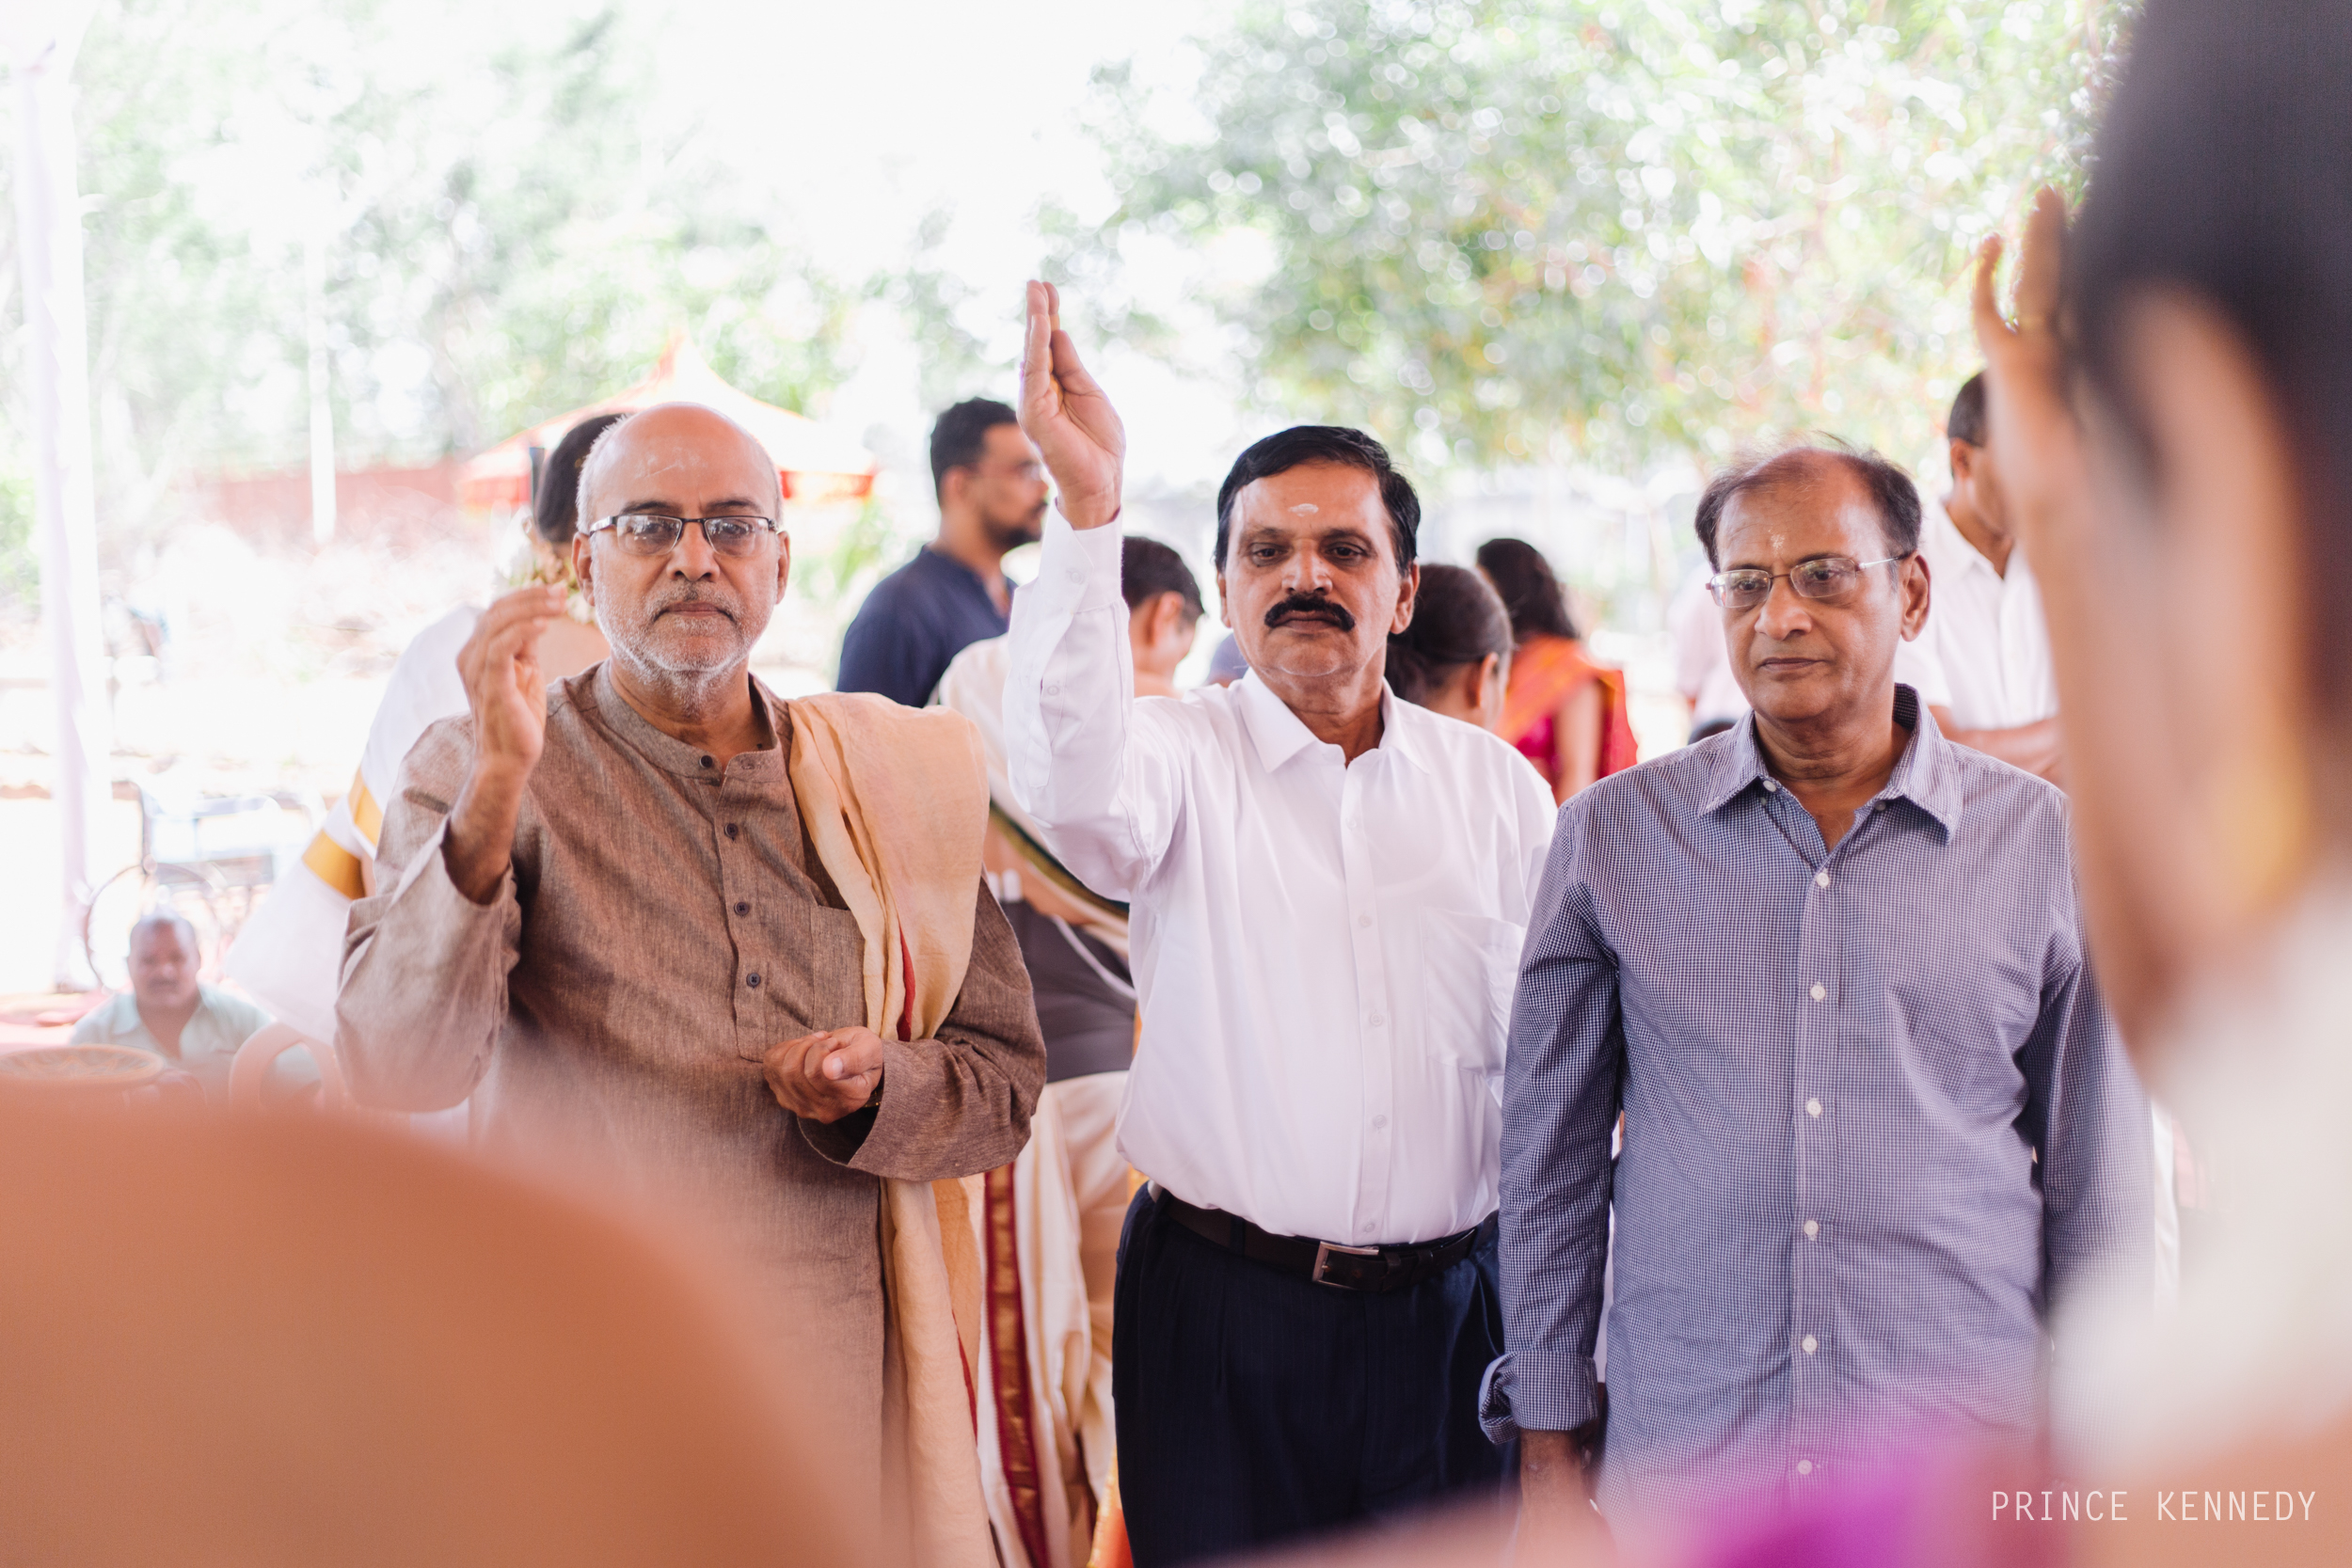 Athmajja-Nithesh-Engagement-Couple-Portrait-Portraiture-Wedding-Couple-Portrait-Chennai-Photographer-Candid-Photography-Destination-Best-Prince-Kennedy-Photography-145.jpg